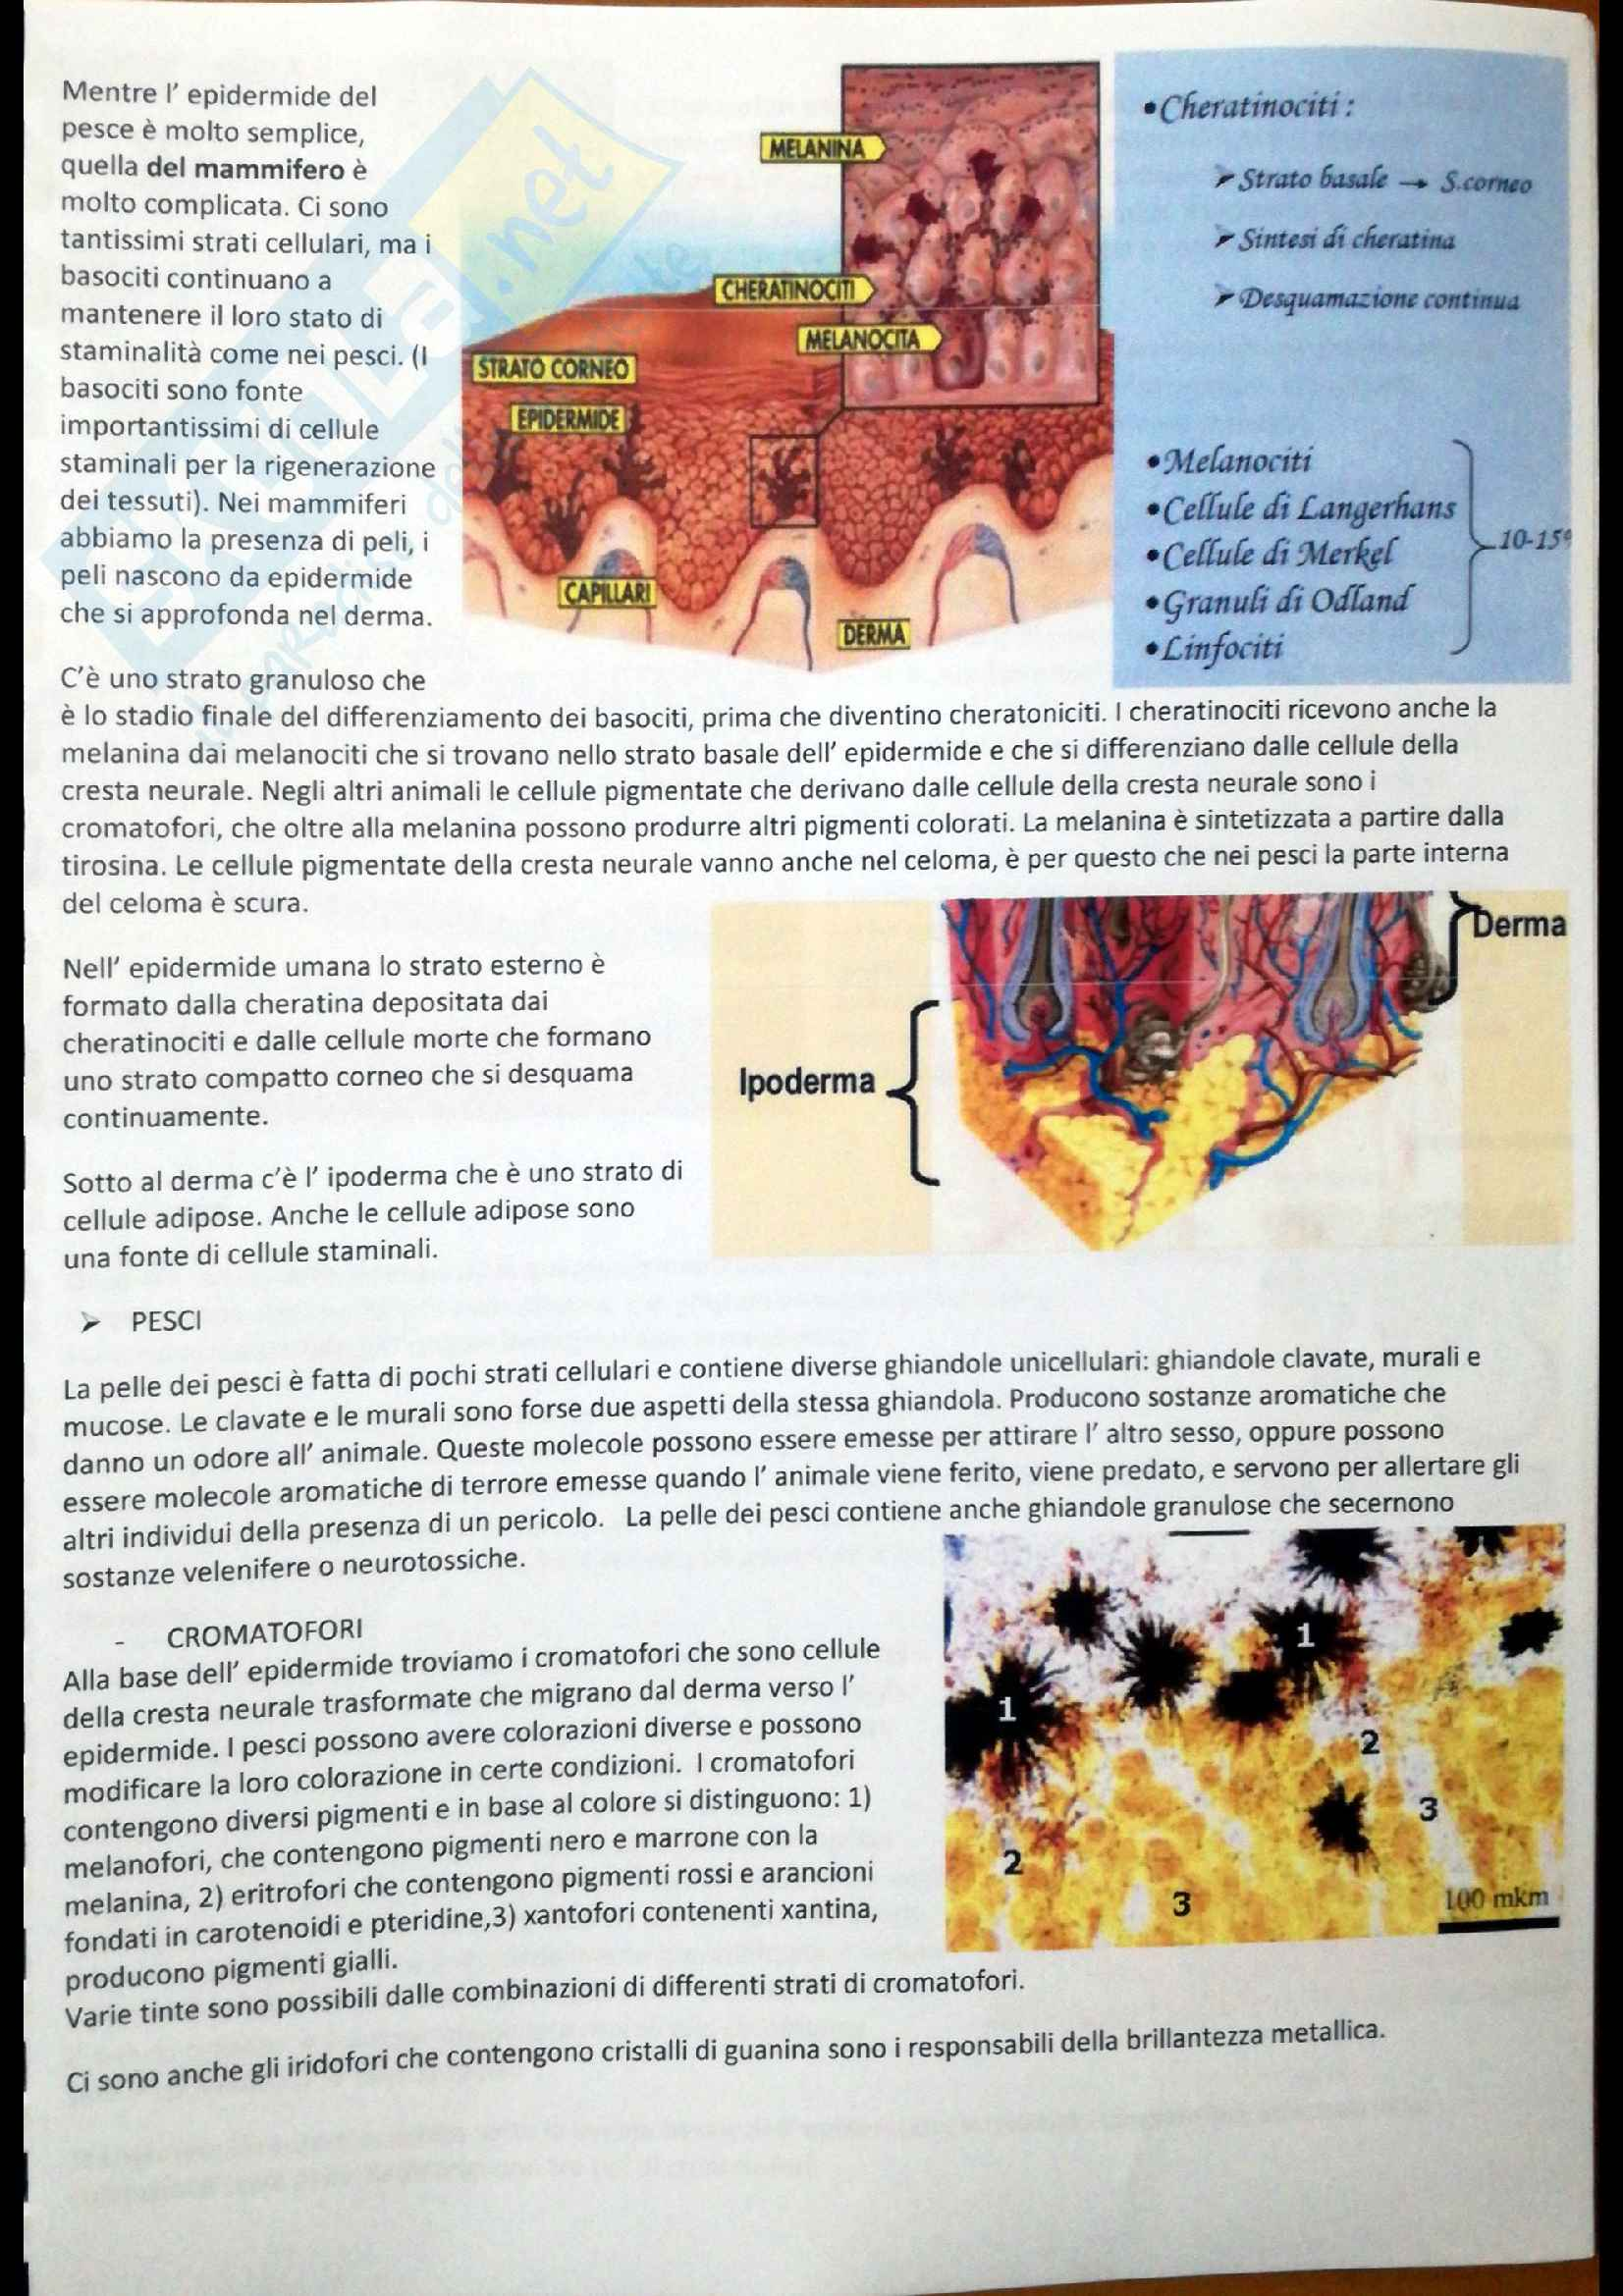 Tegumento, Anatomia Comparata Pag. 2